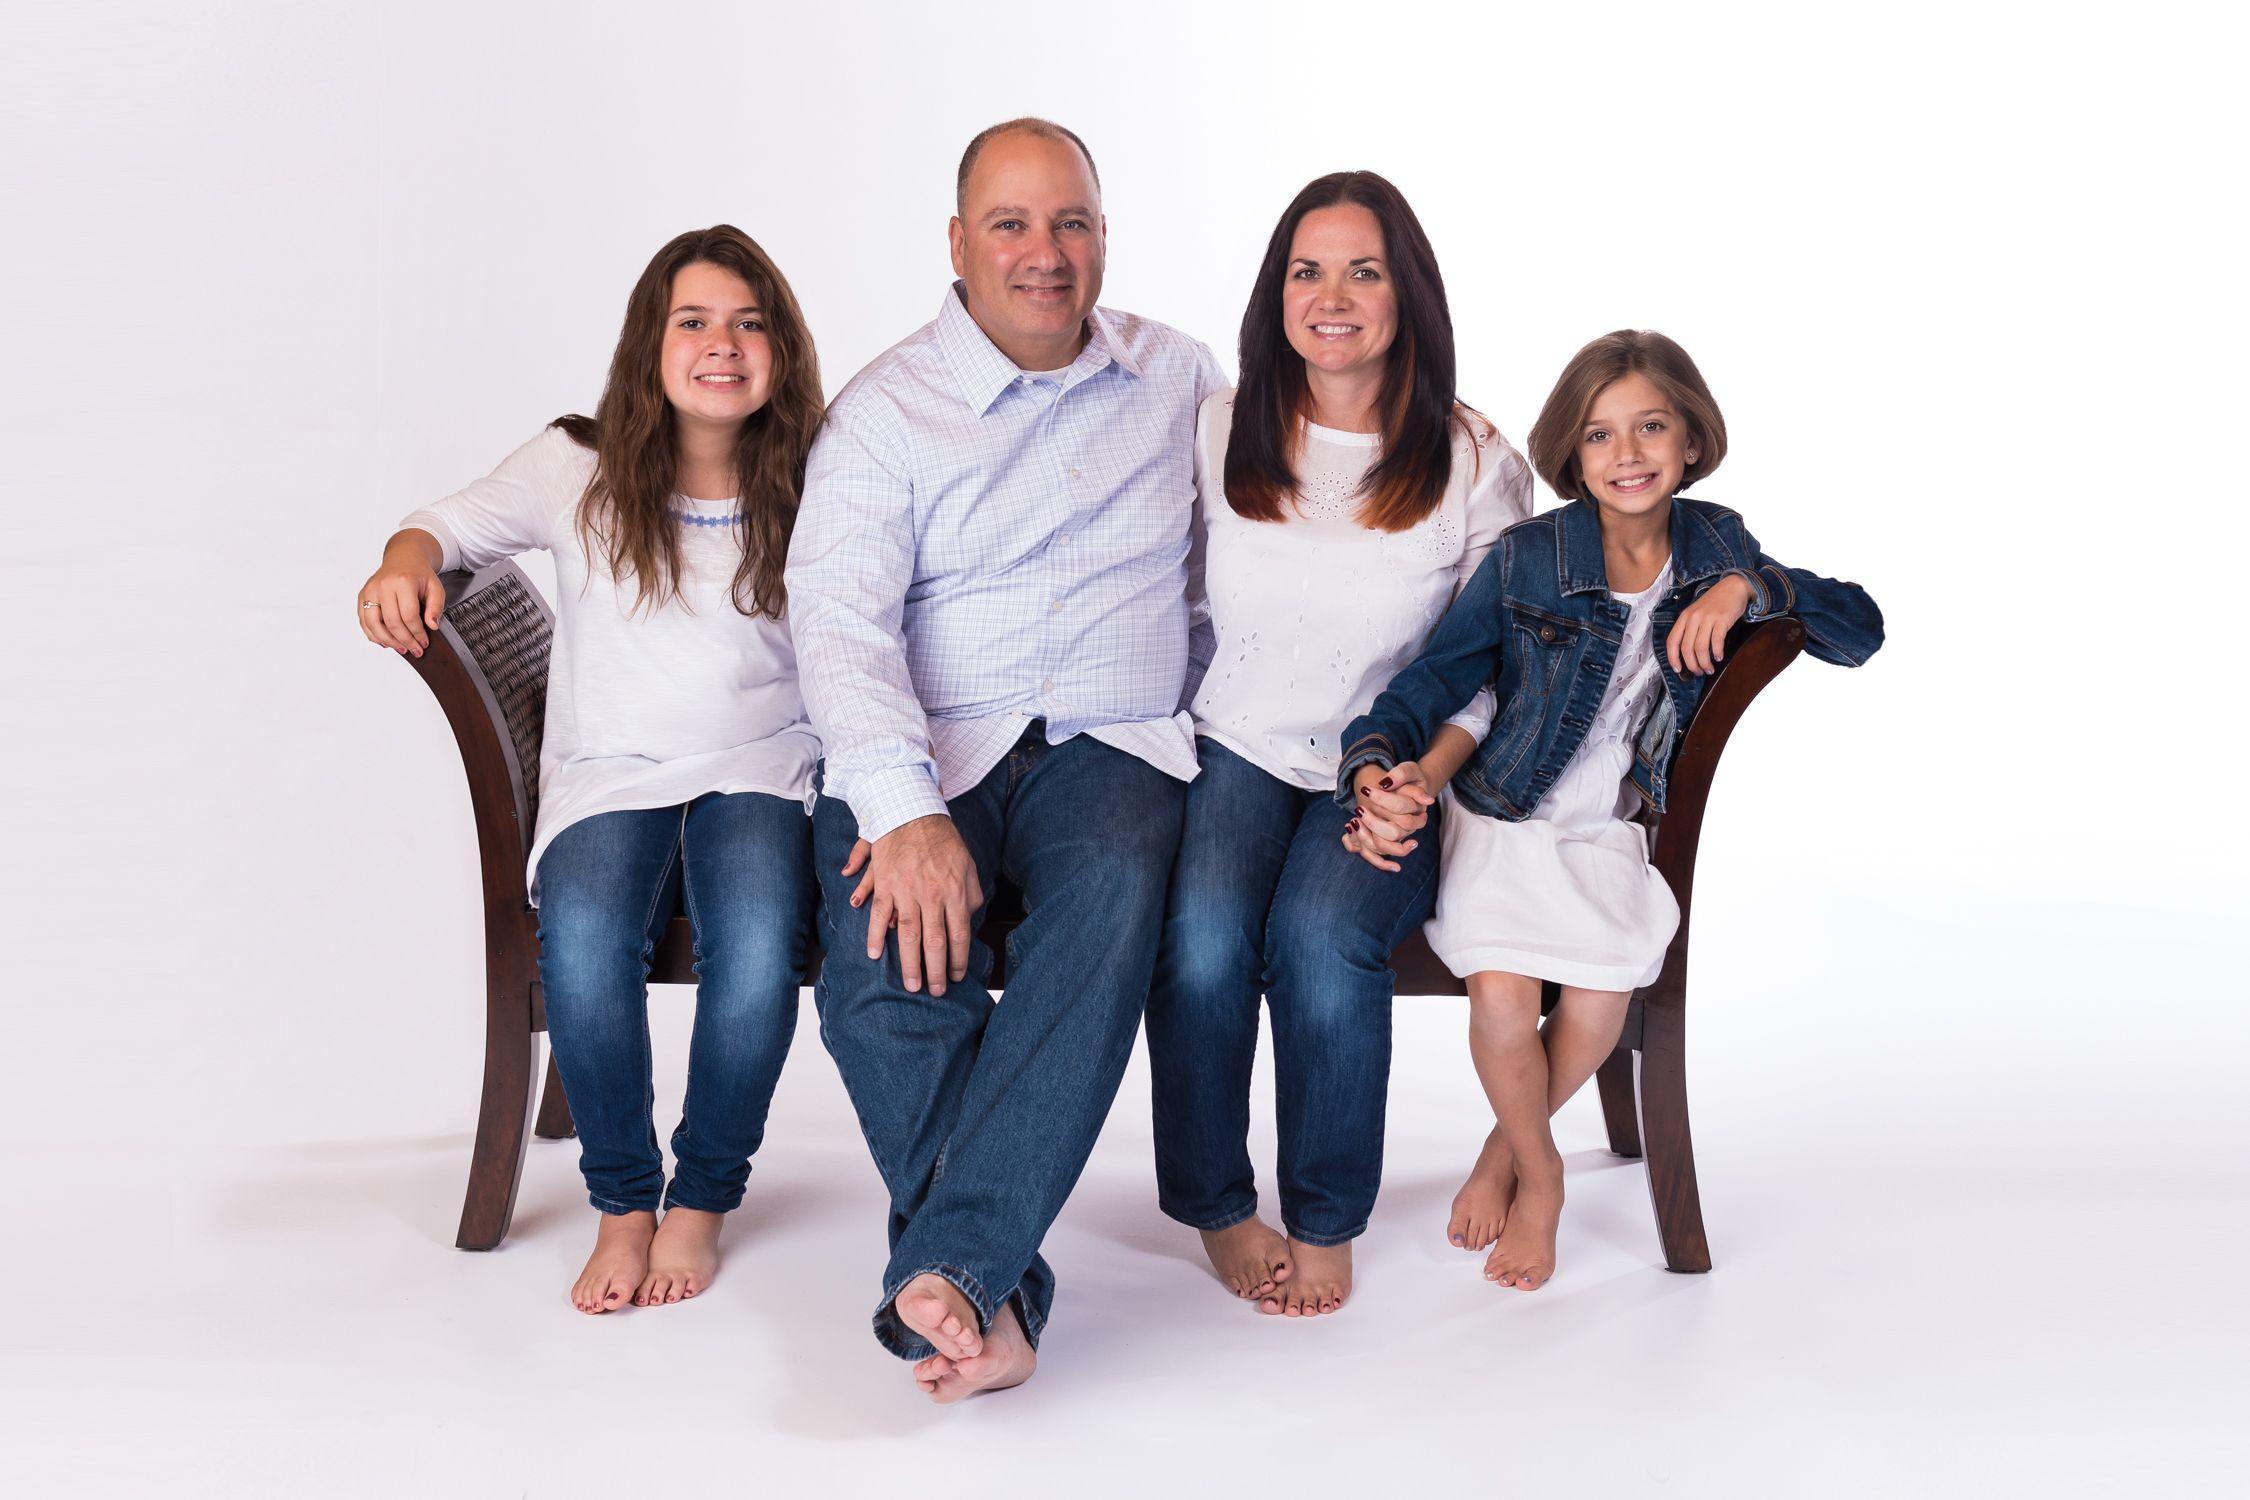 Family portrait white background 1